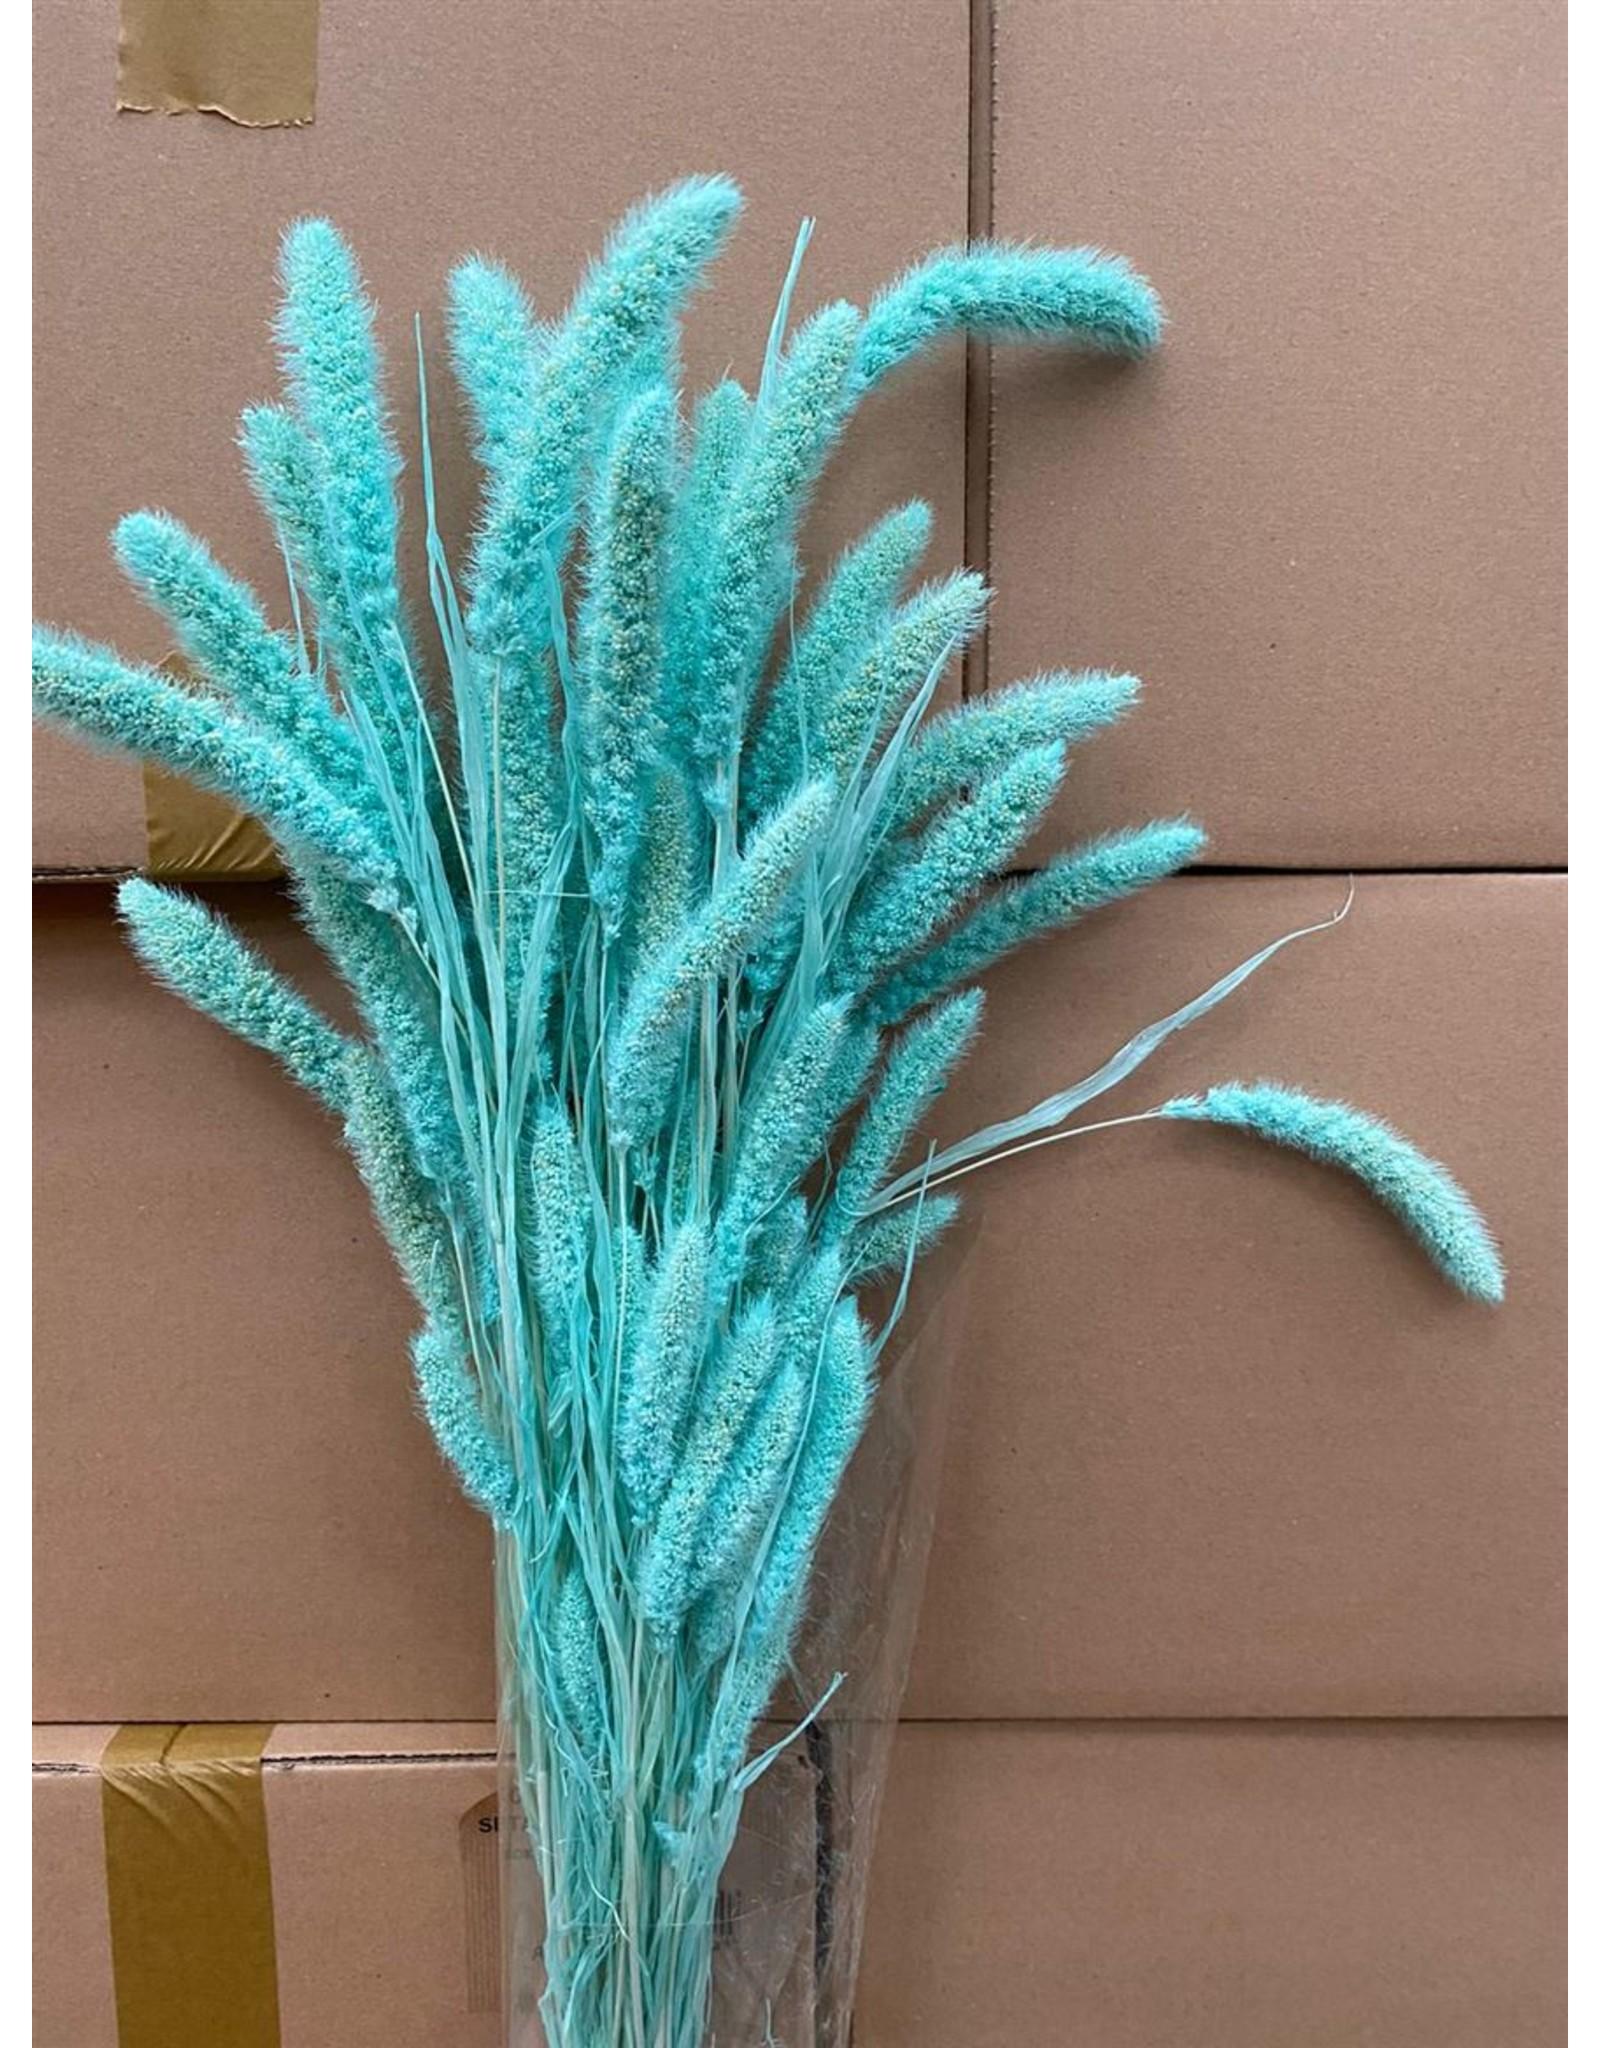 GF Dried Setaria Aqua Blue Bunch x 2